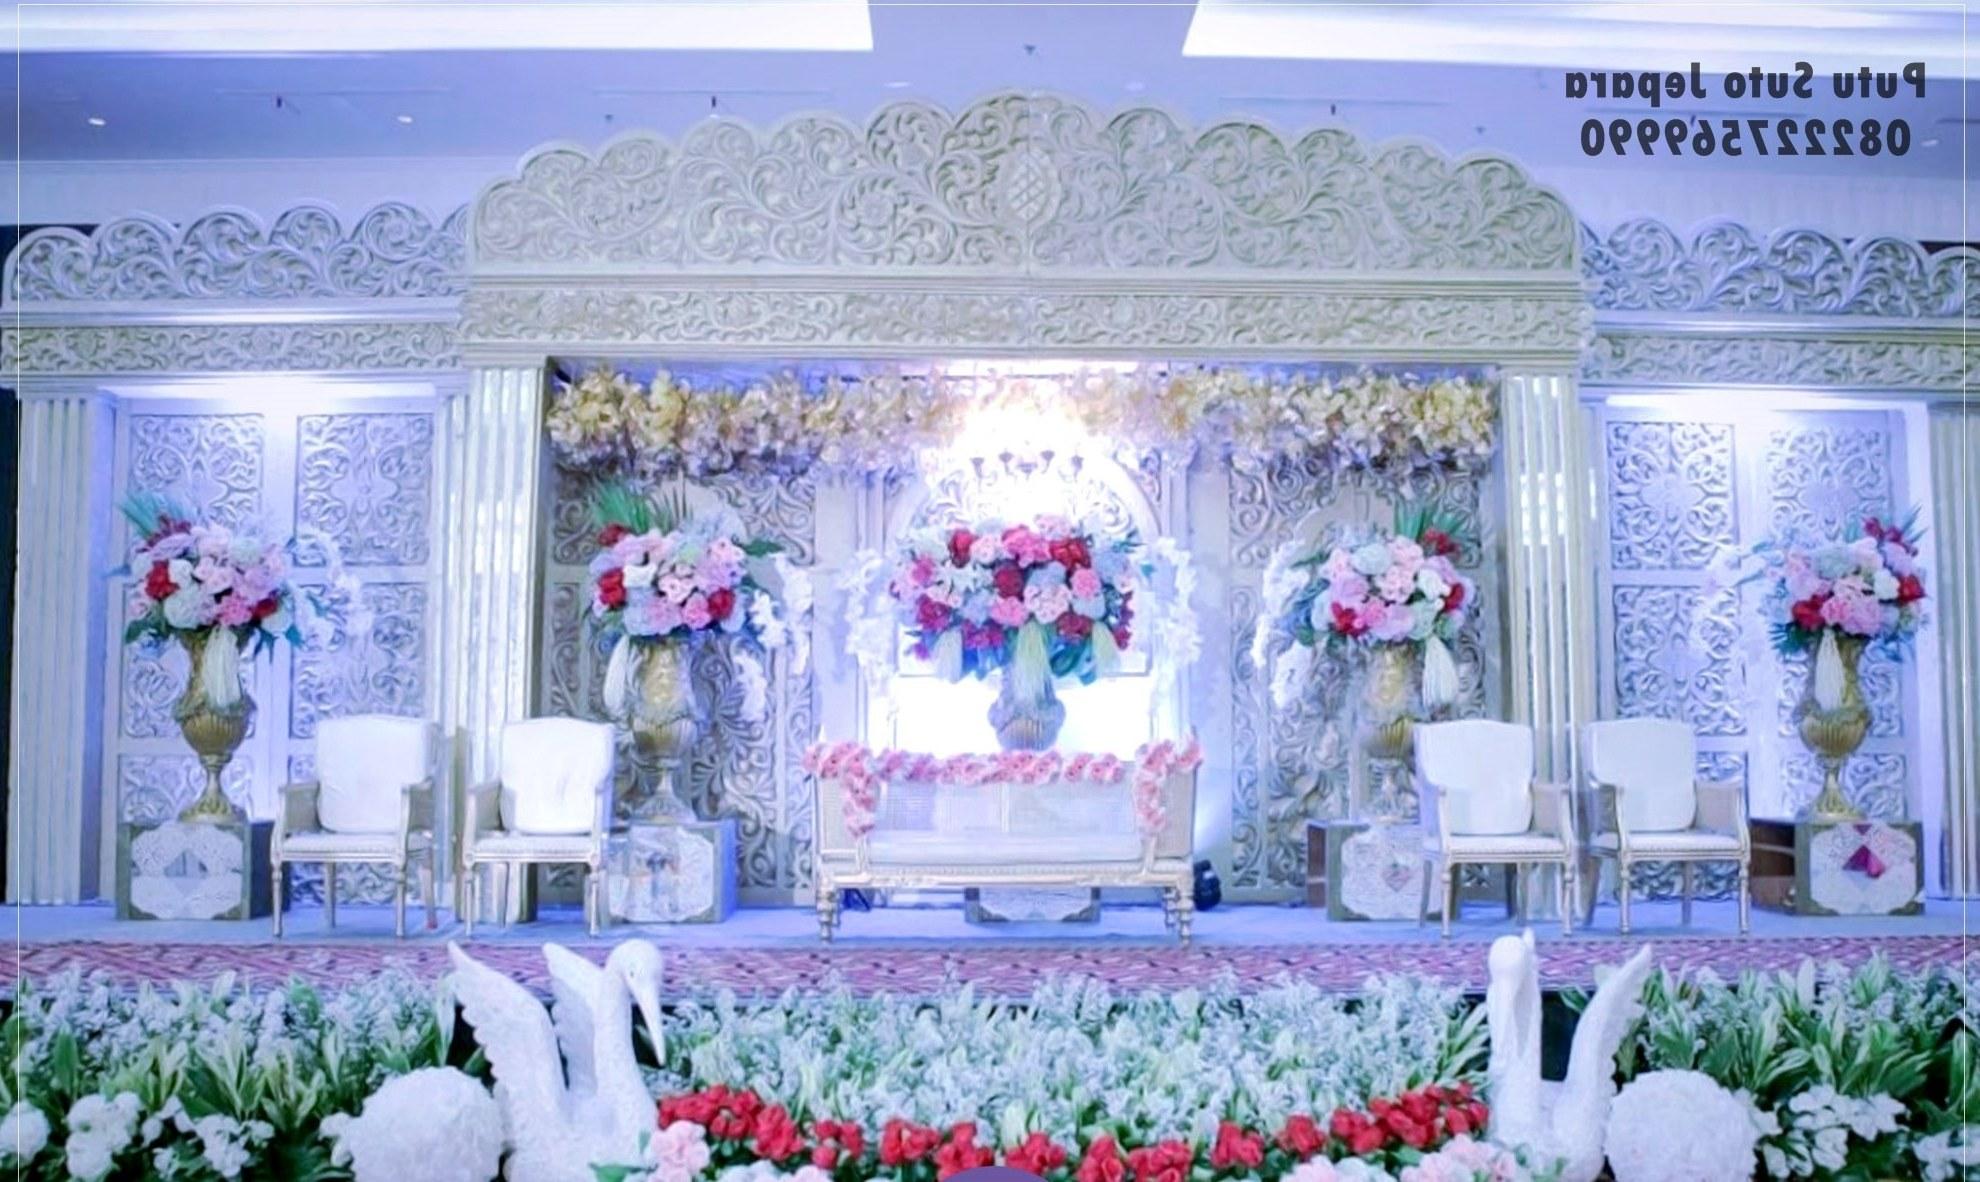 Bentuk Baju Selayar Pengantin Muslim T8dj Dekorasi Pernikahan Cantik Gedung Mangaraja – Photo Wedding